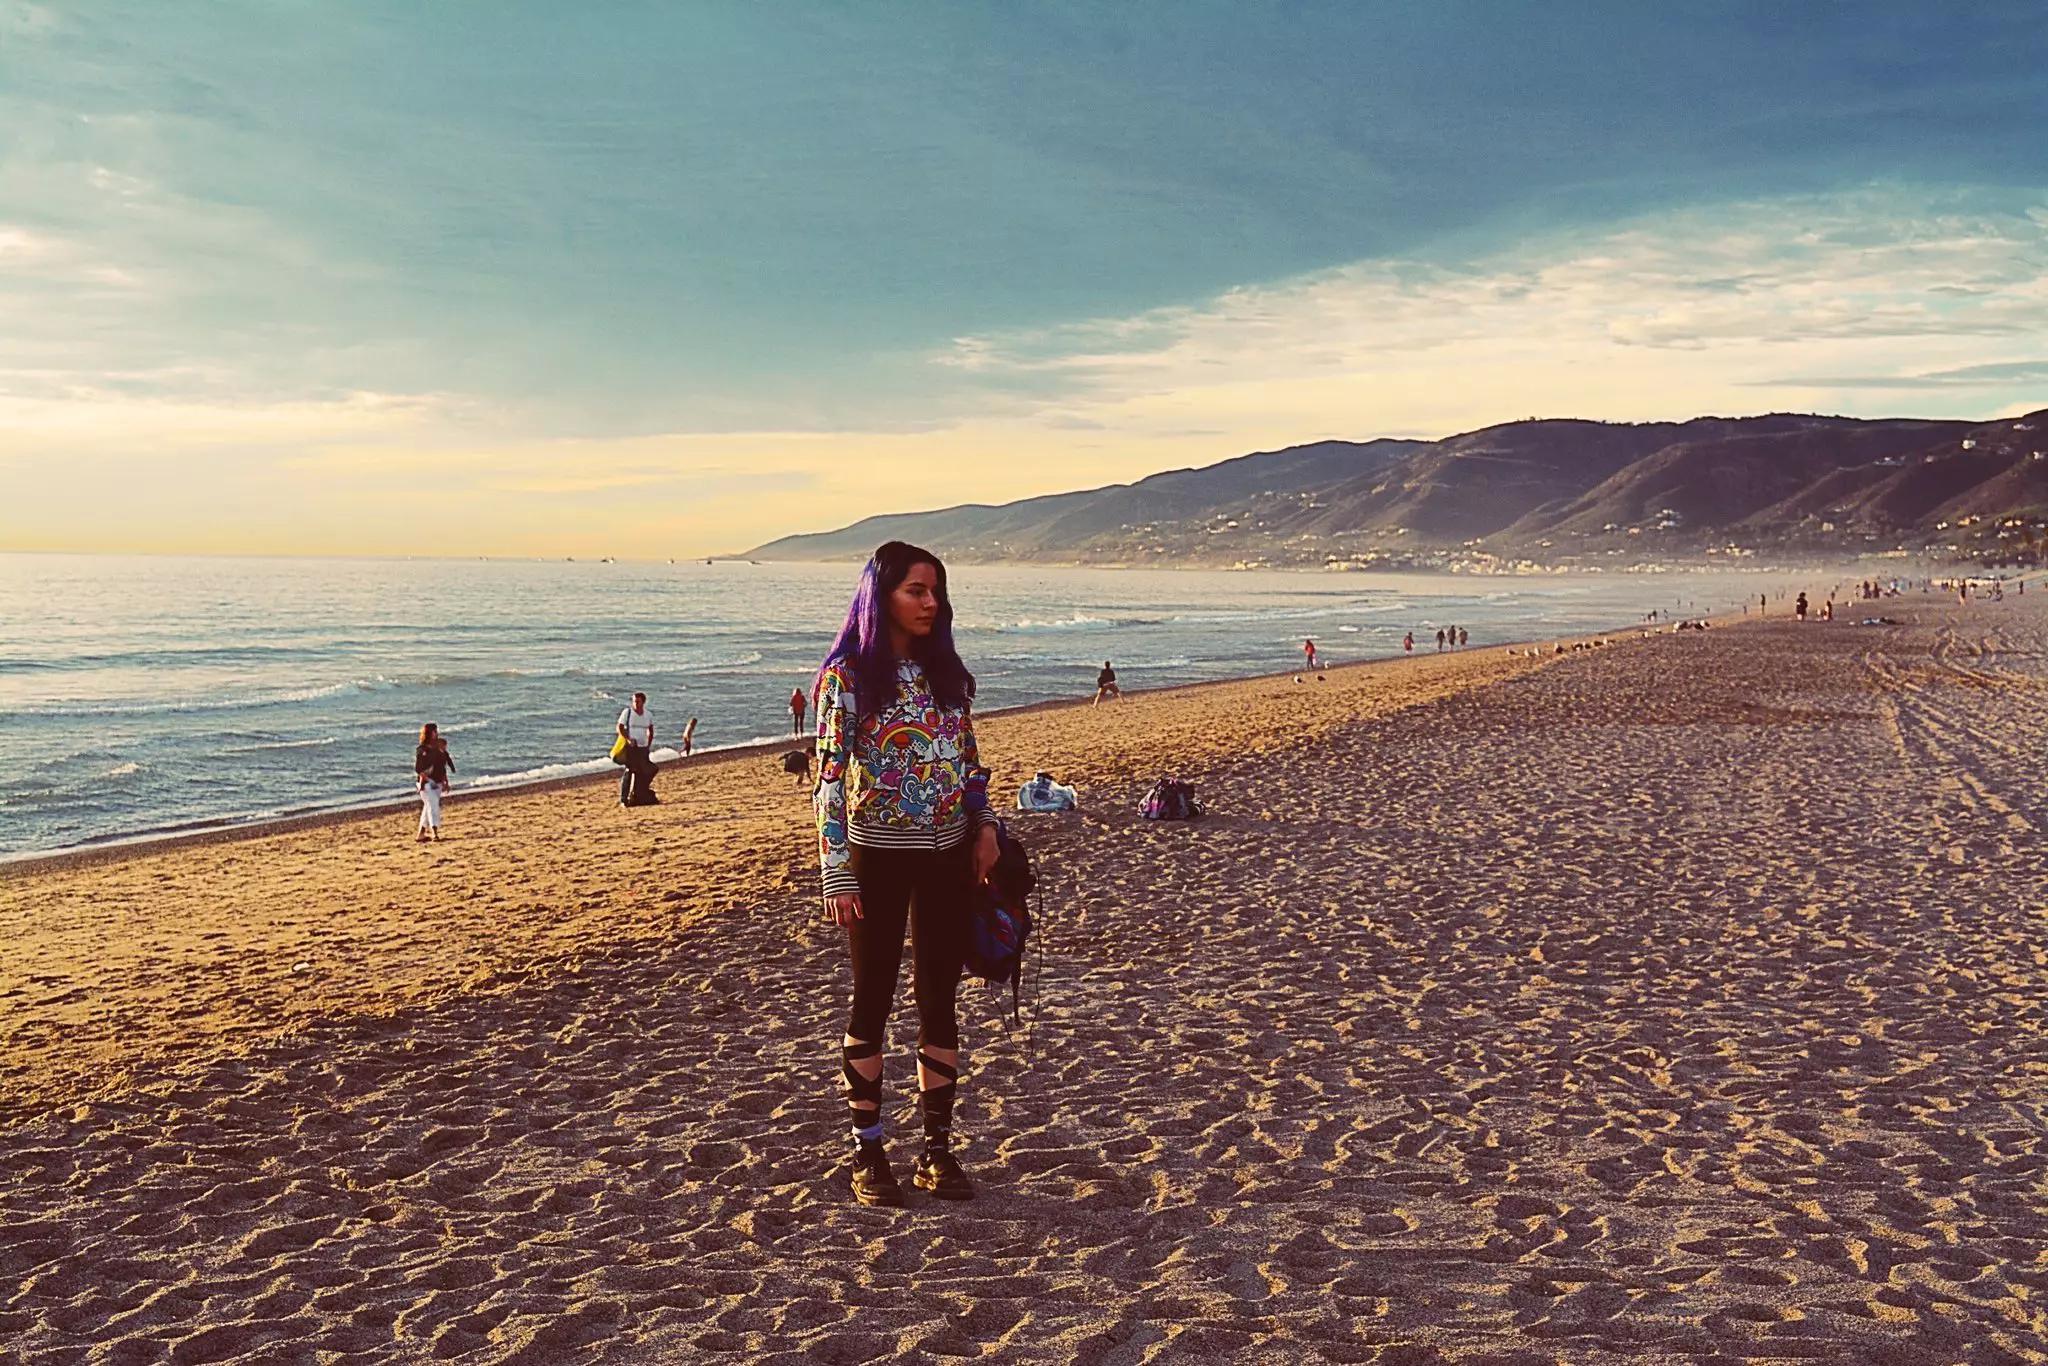 Meresha-on-Zuma-Beach-Dec-2016